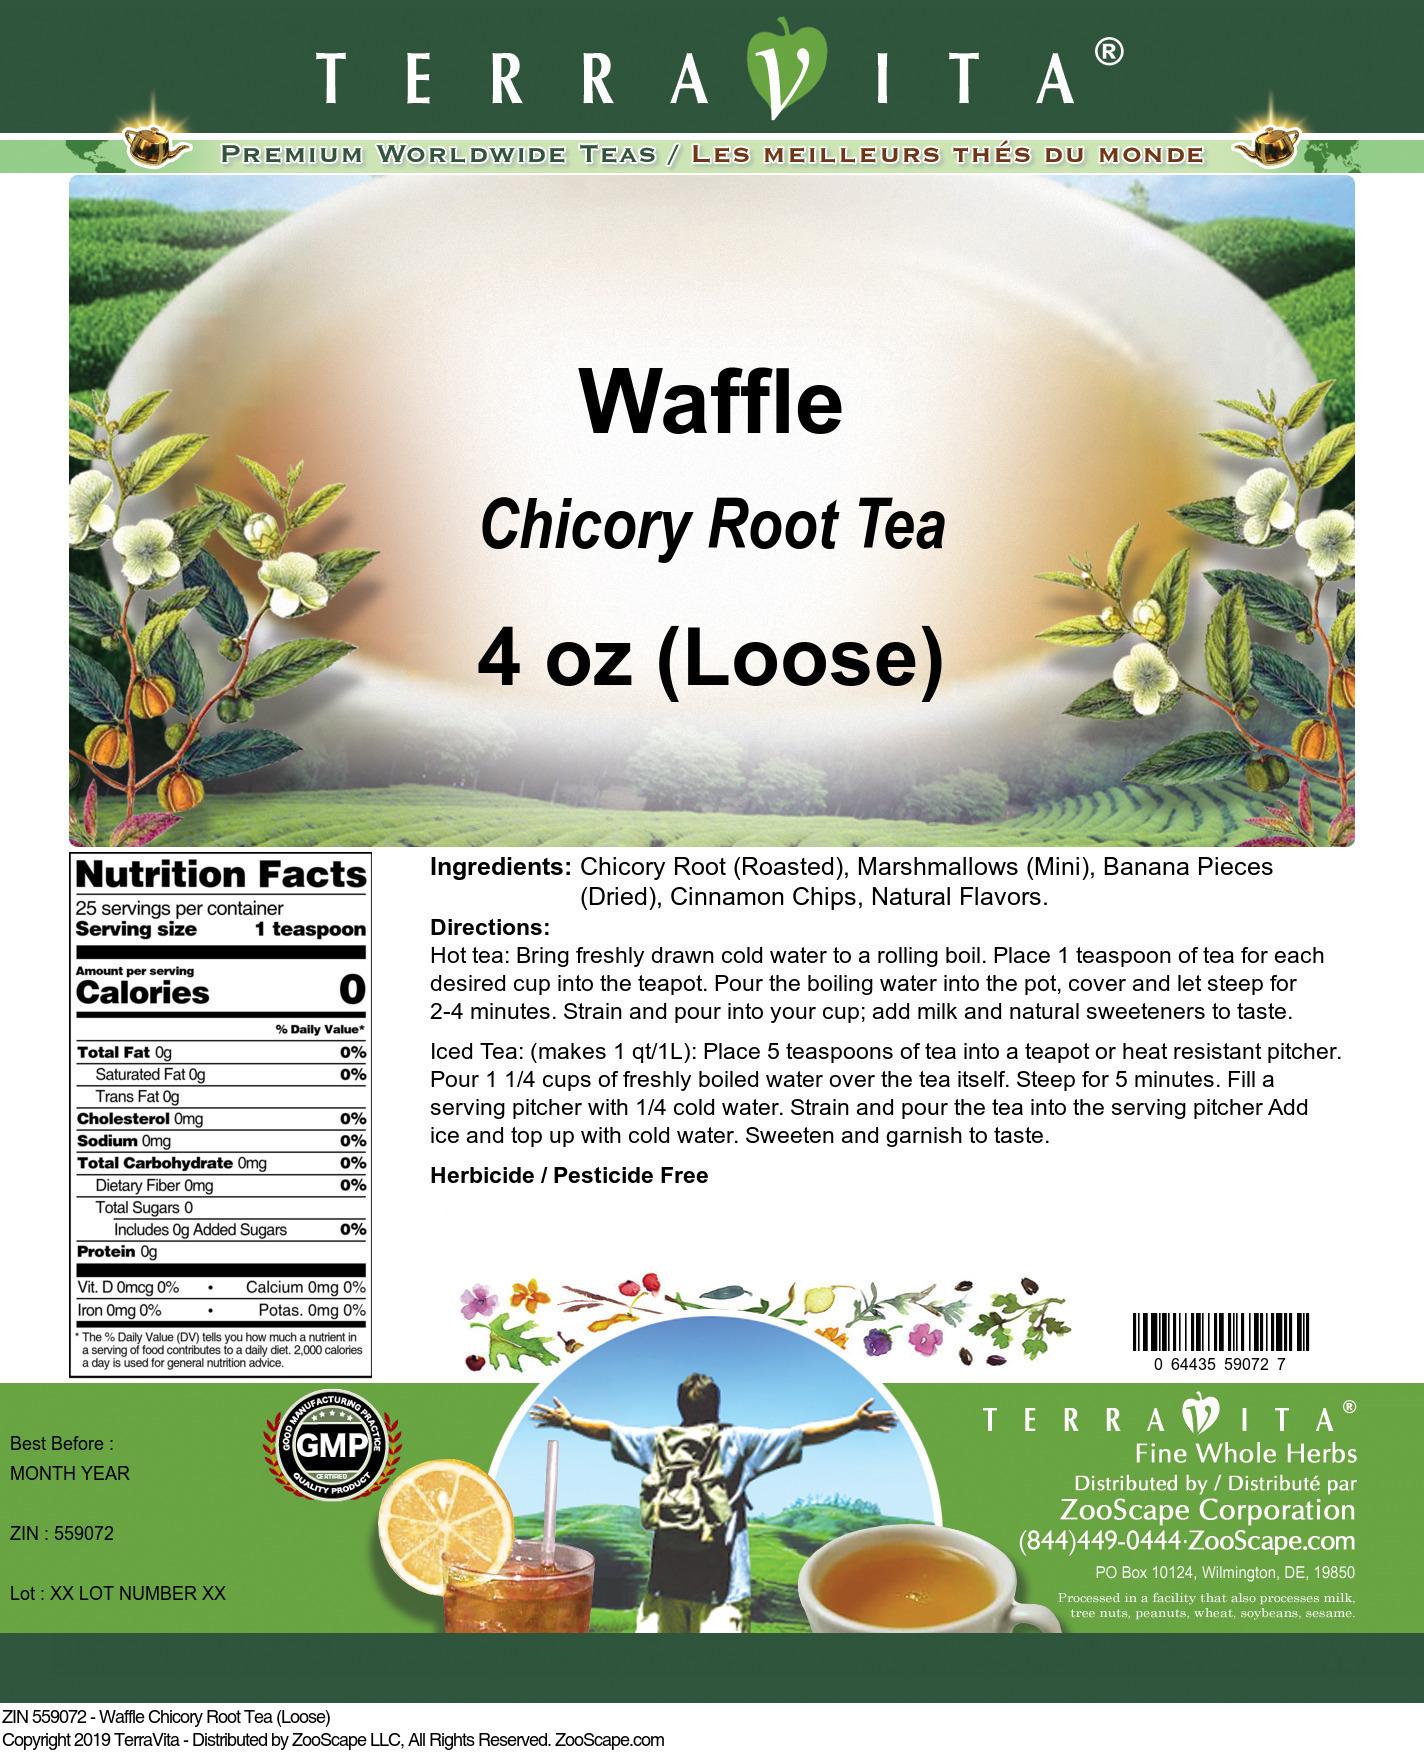 Waffle Chicory Root